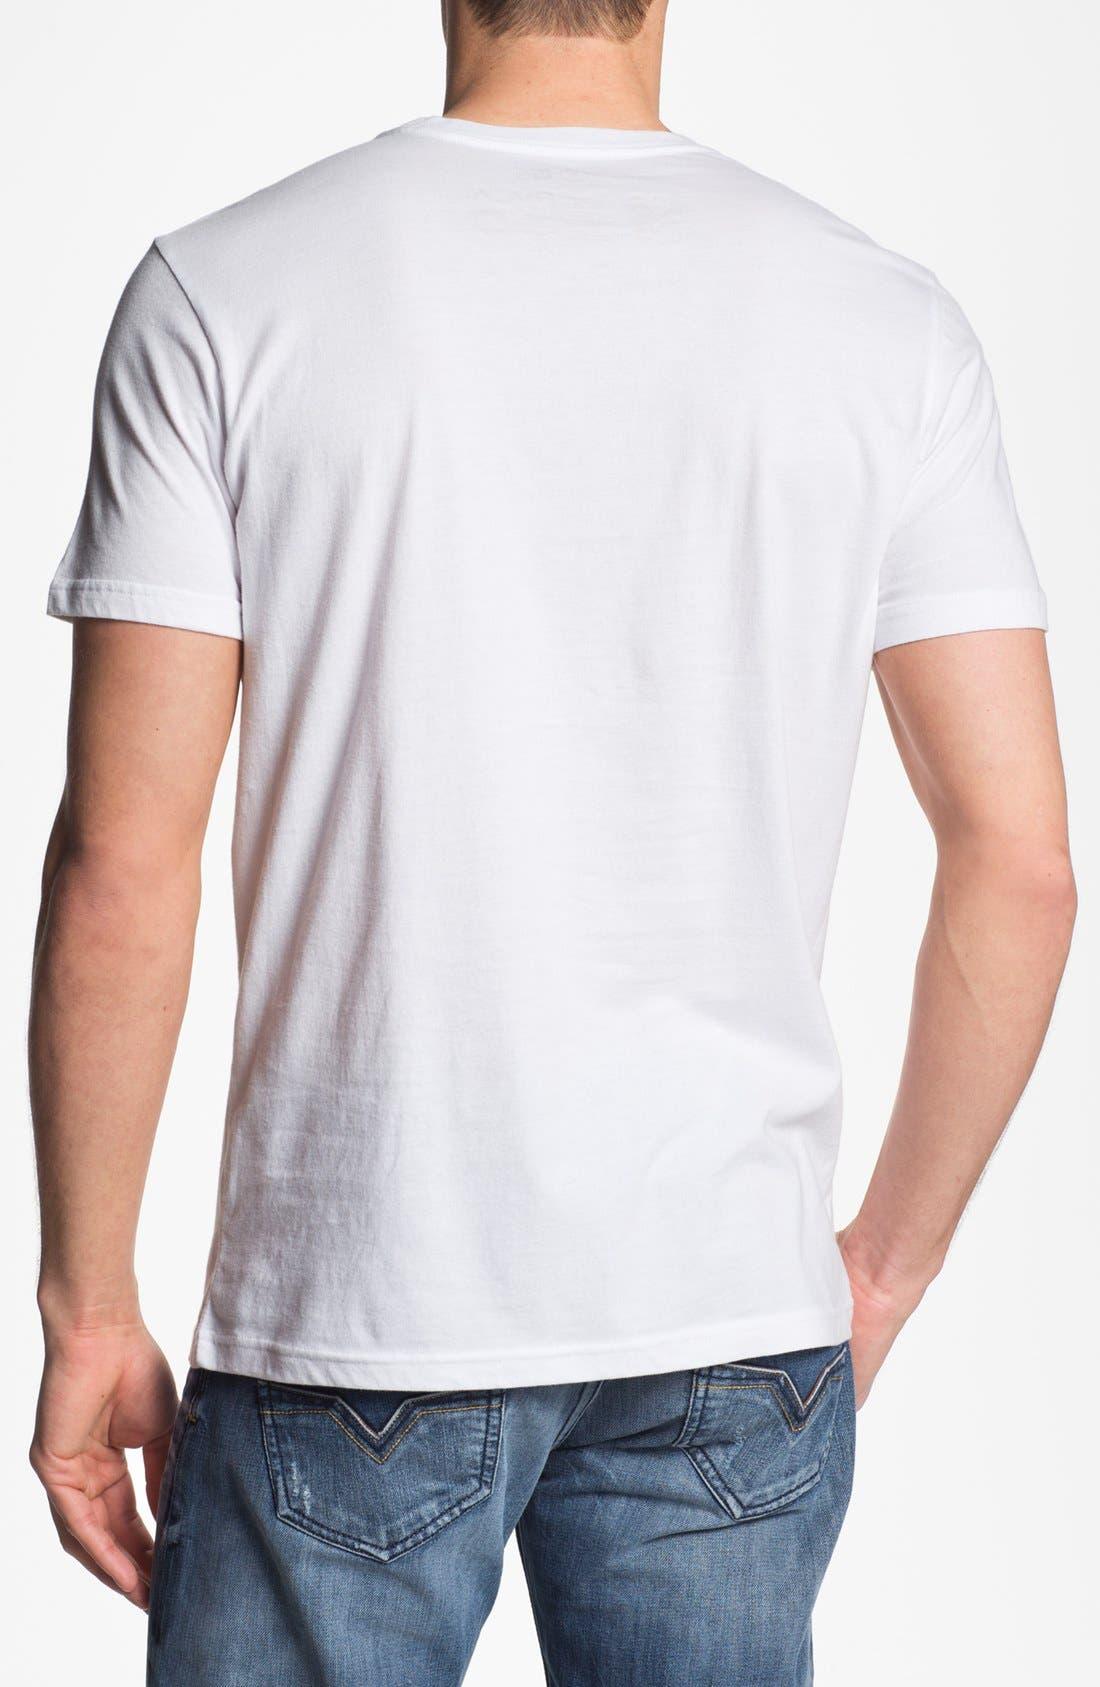 Alternate Image 2  - RVCA 'Illusions' Graphic T-Shirt